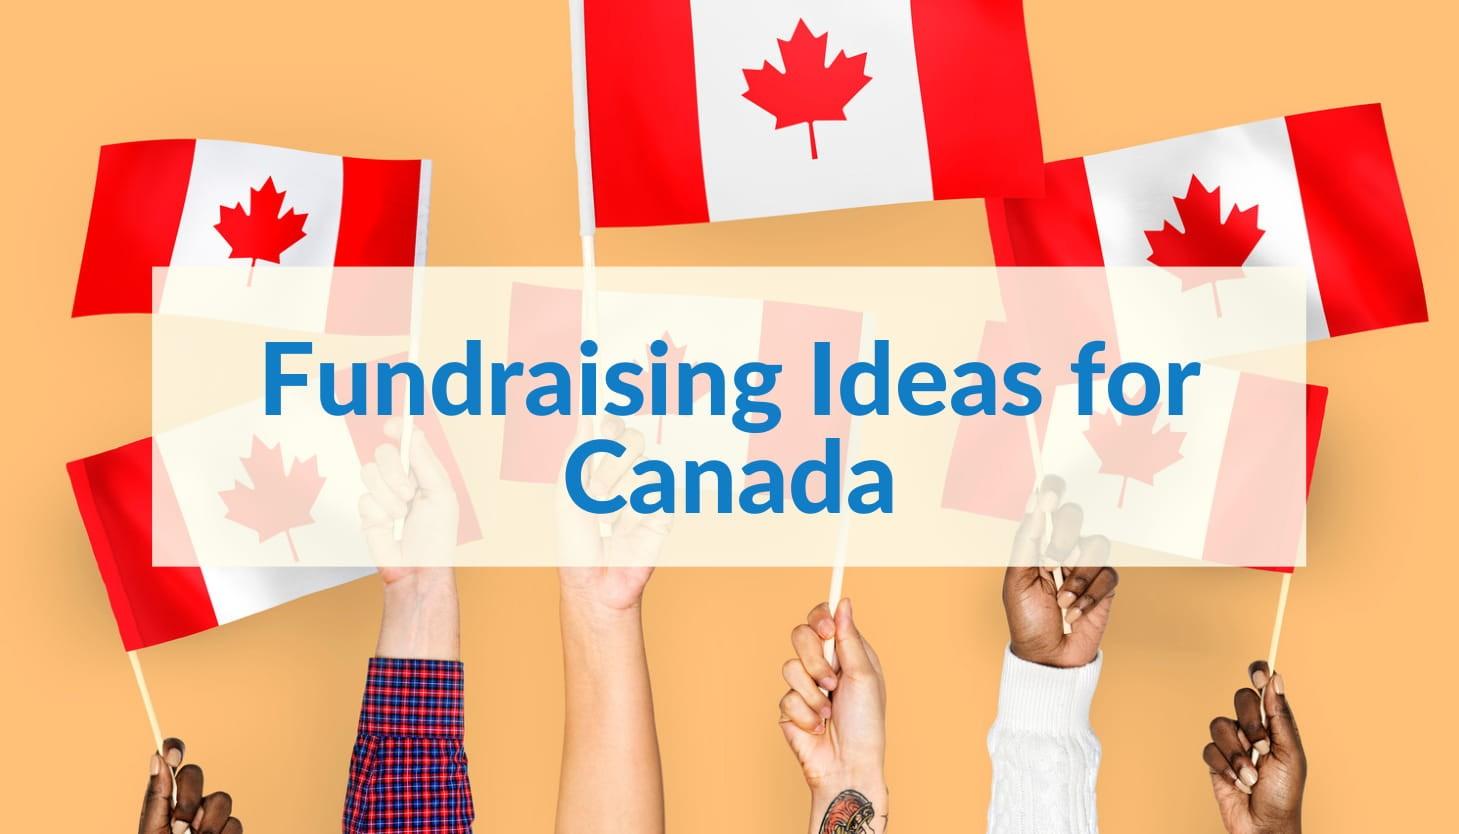 Fundraising Ideas for Canada